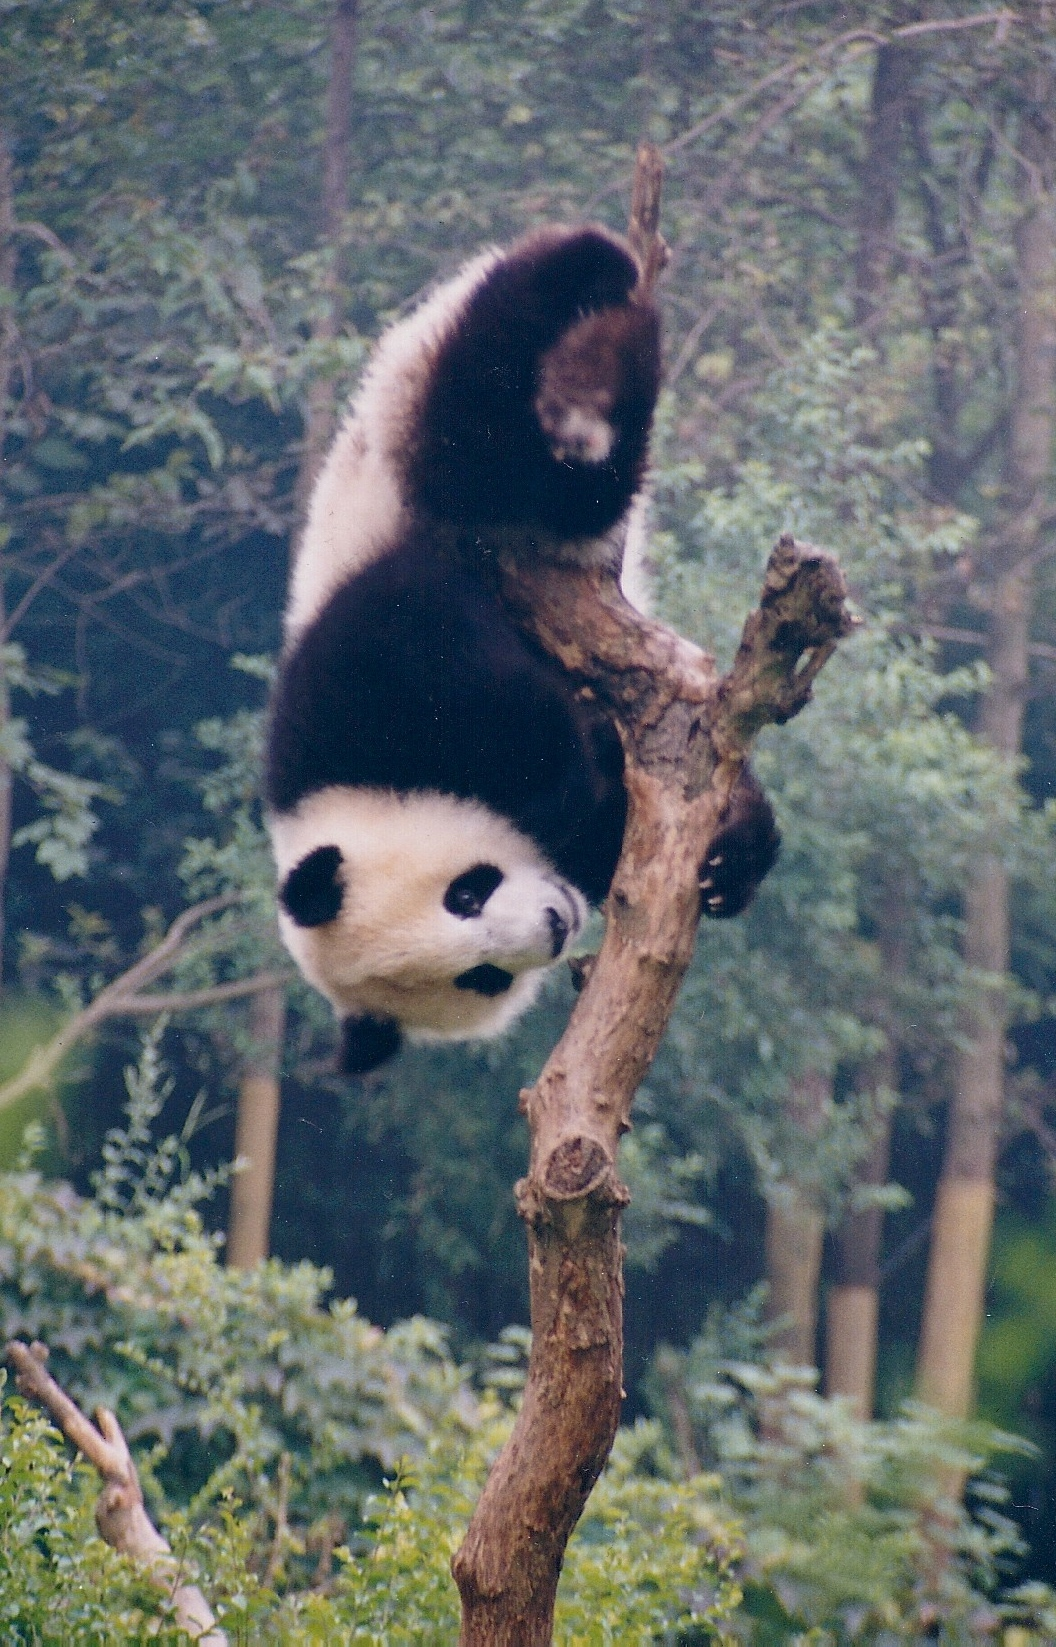 Upside down panda